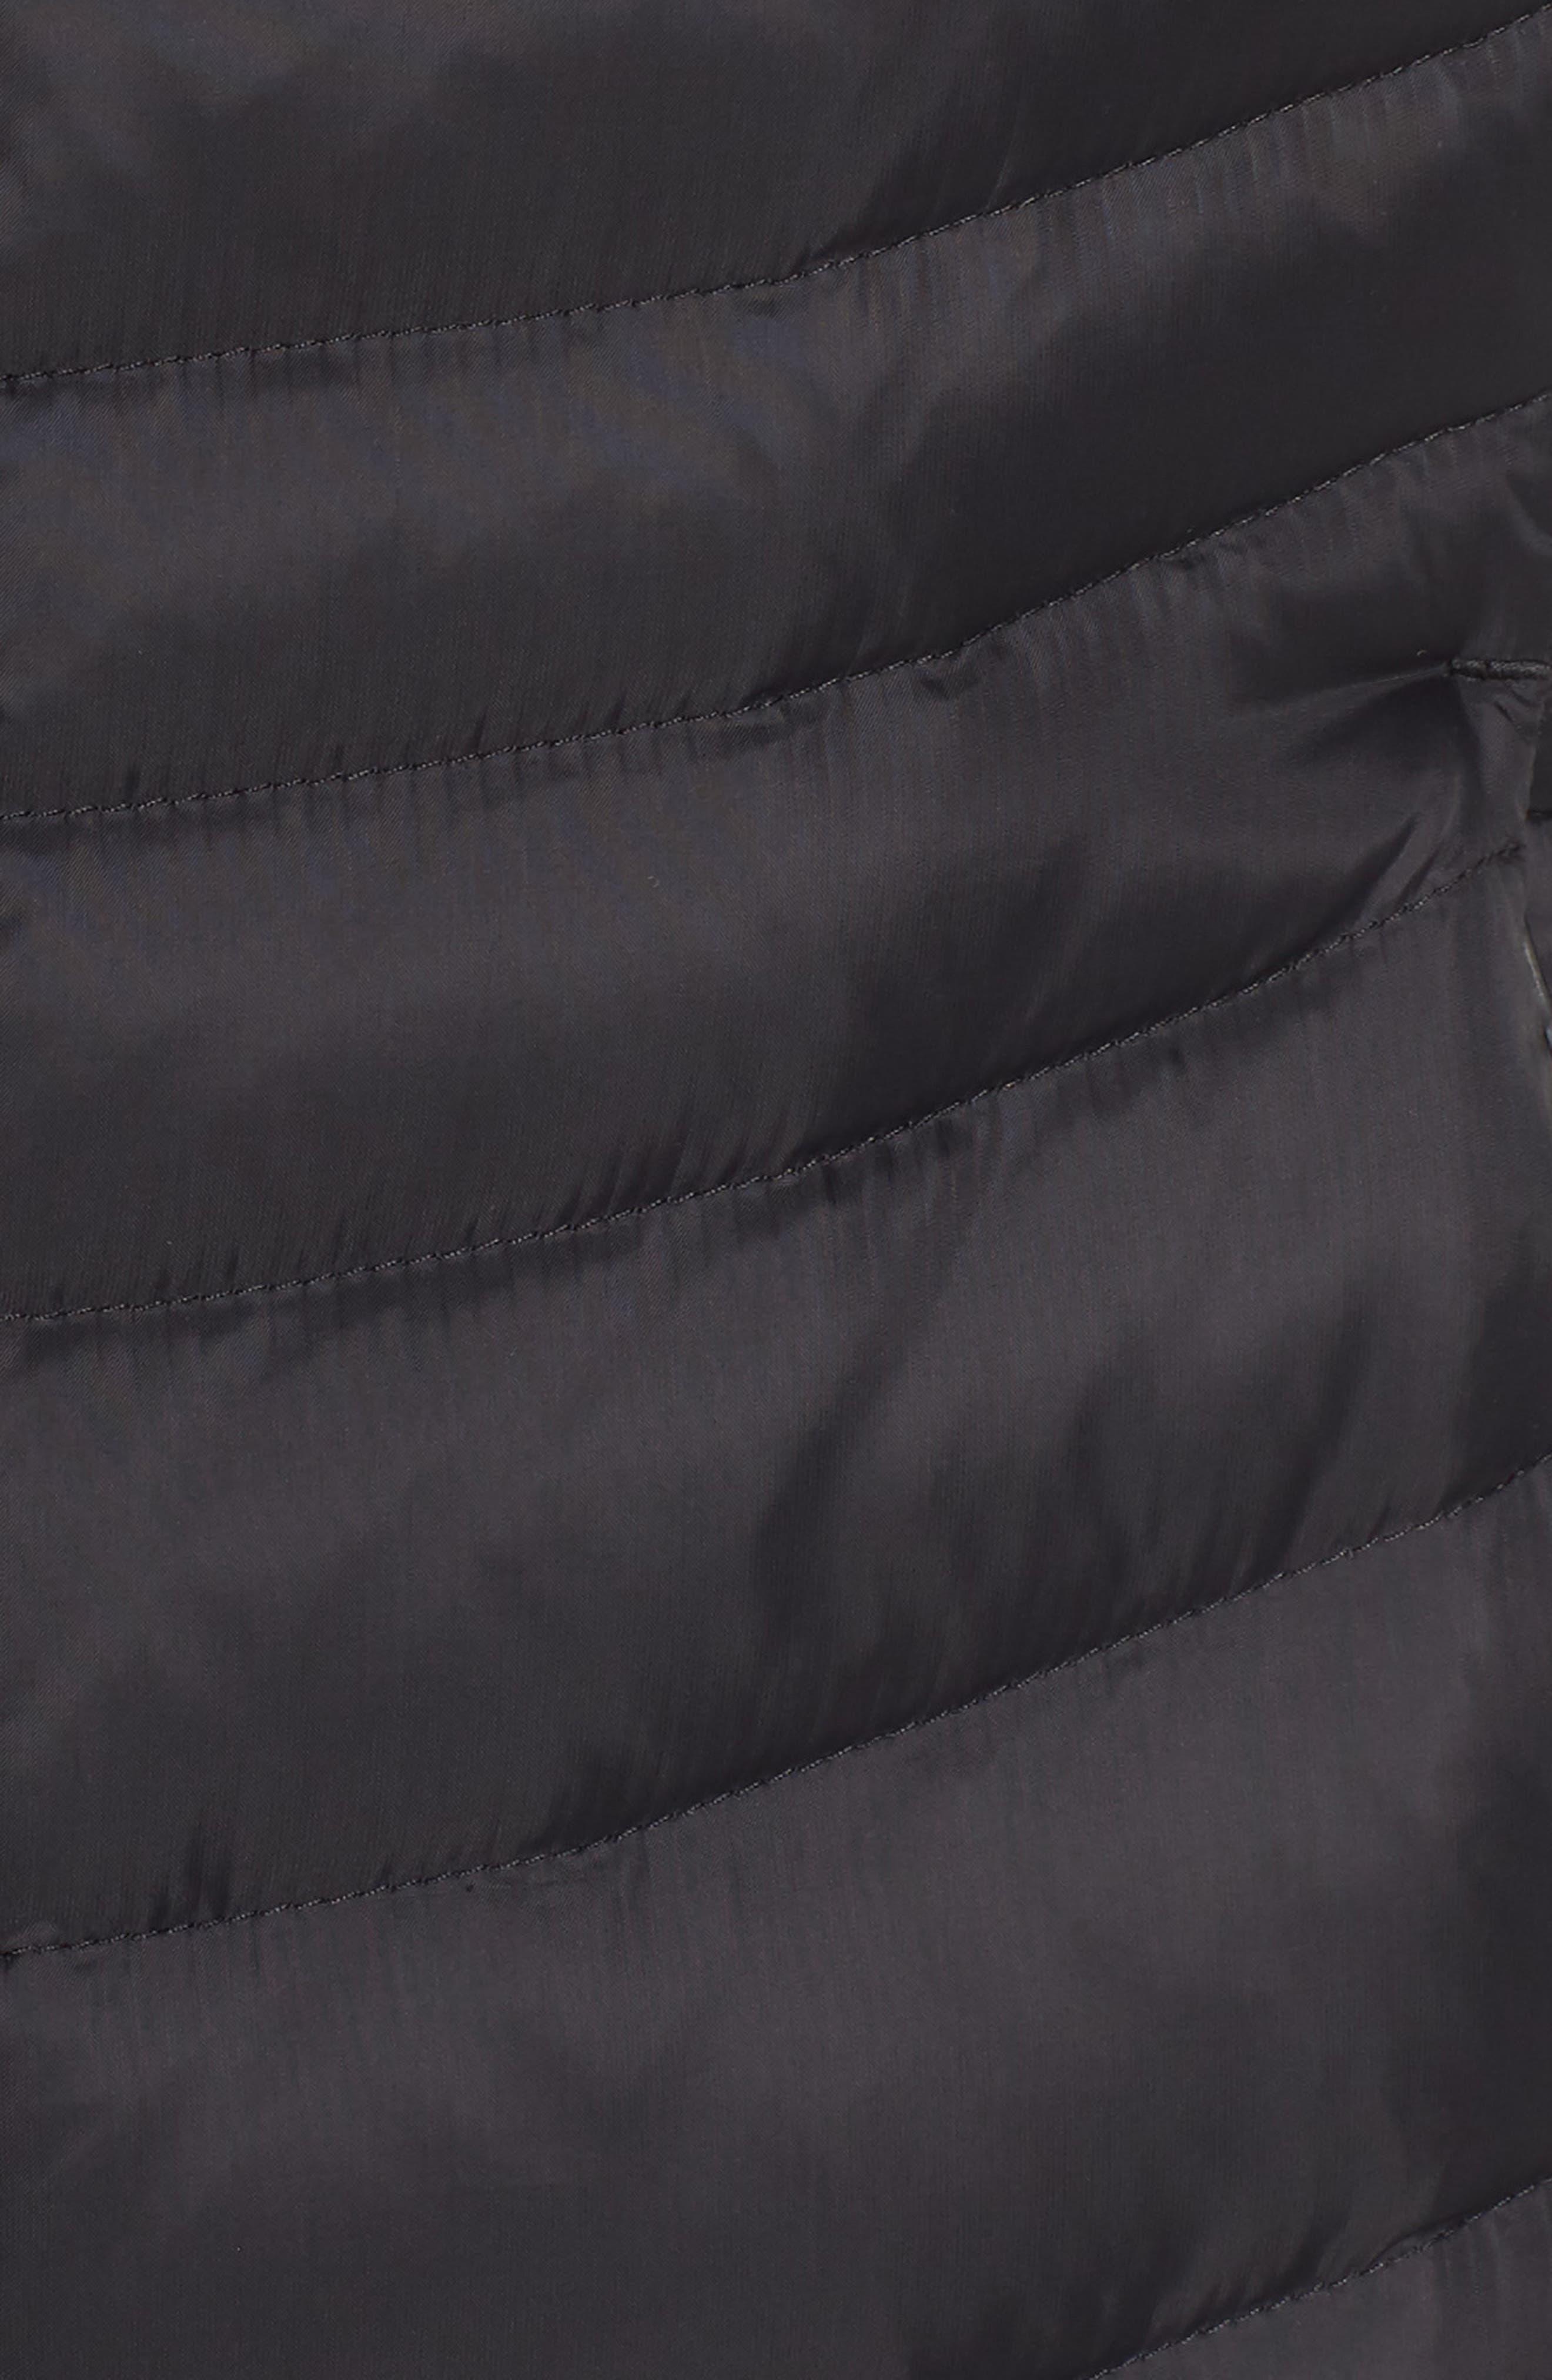 THE NORTH FACE,                             Aconcagua II Down Vest,                             Alternate thumbnail 7, color,                             001